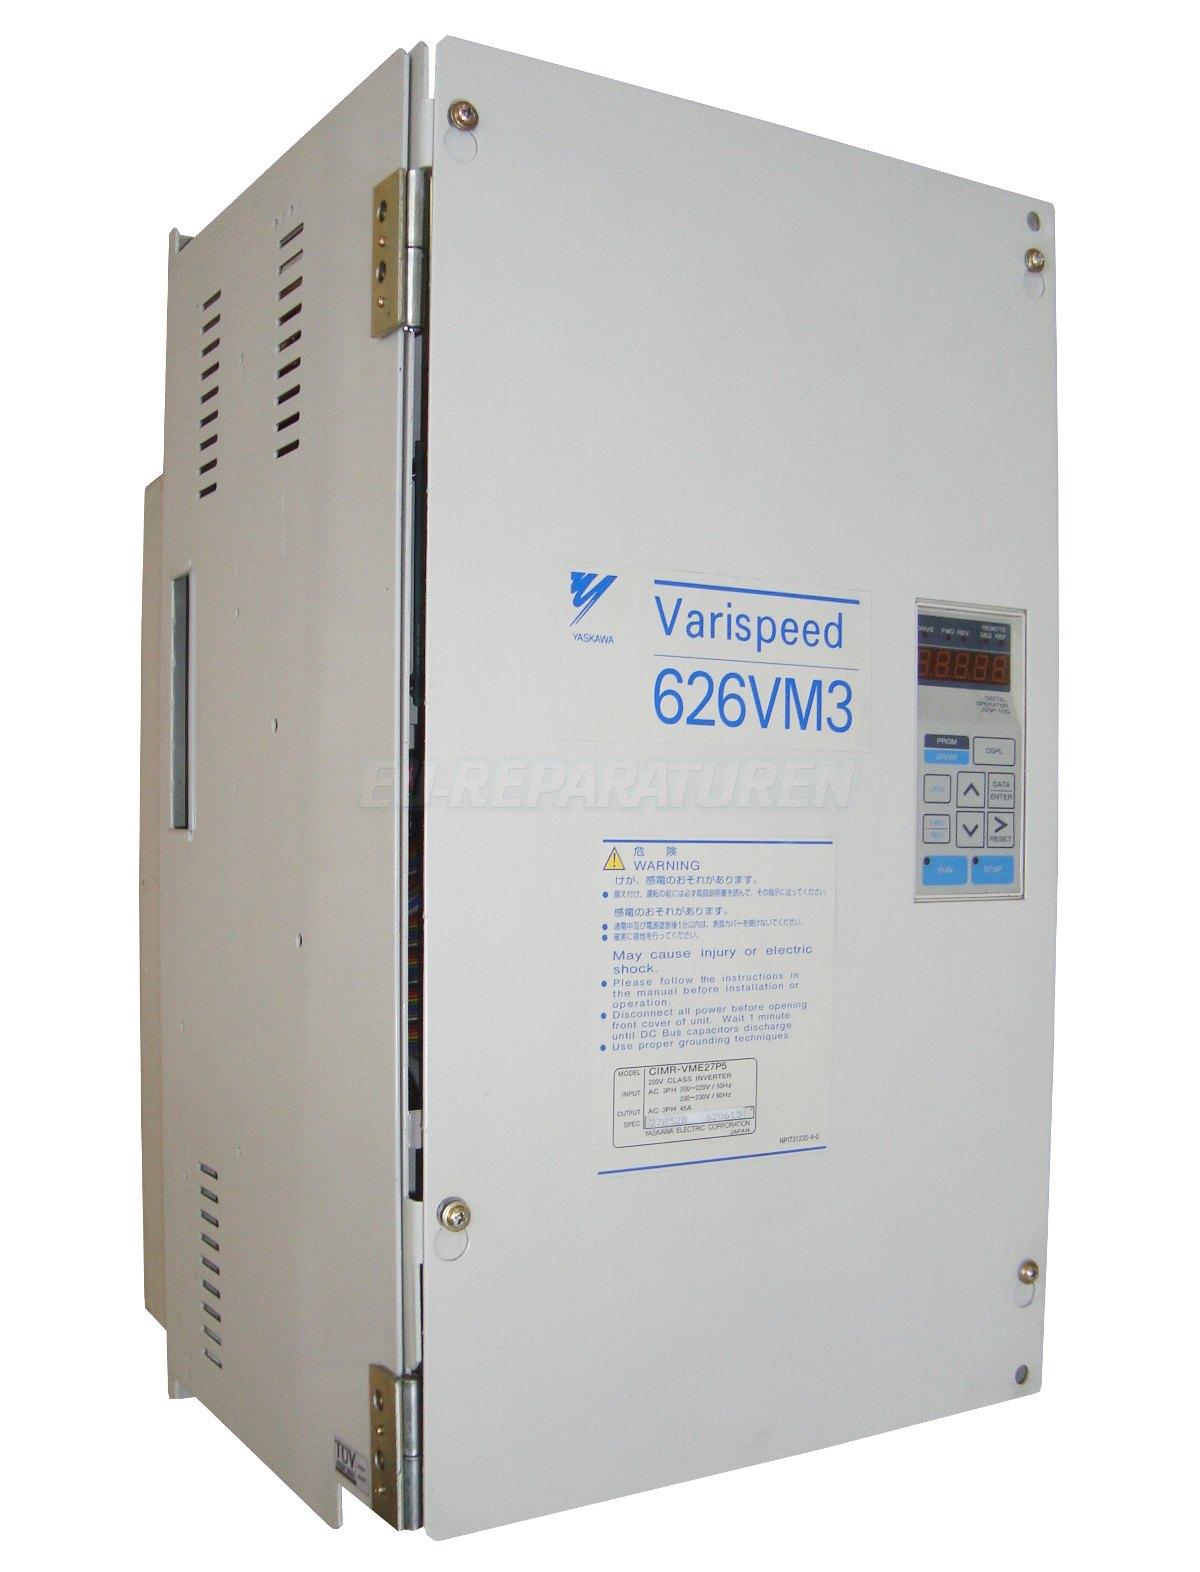 Reparatur Yaskawa CIMR-VME27P5 AC DRIVE